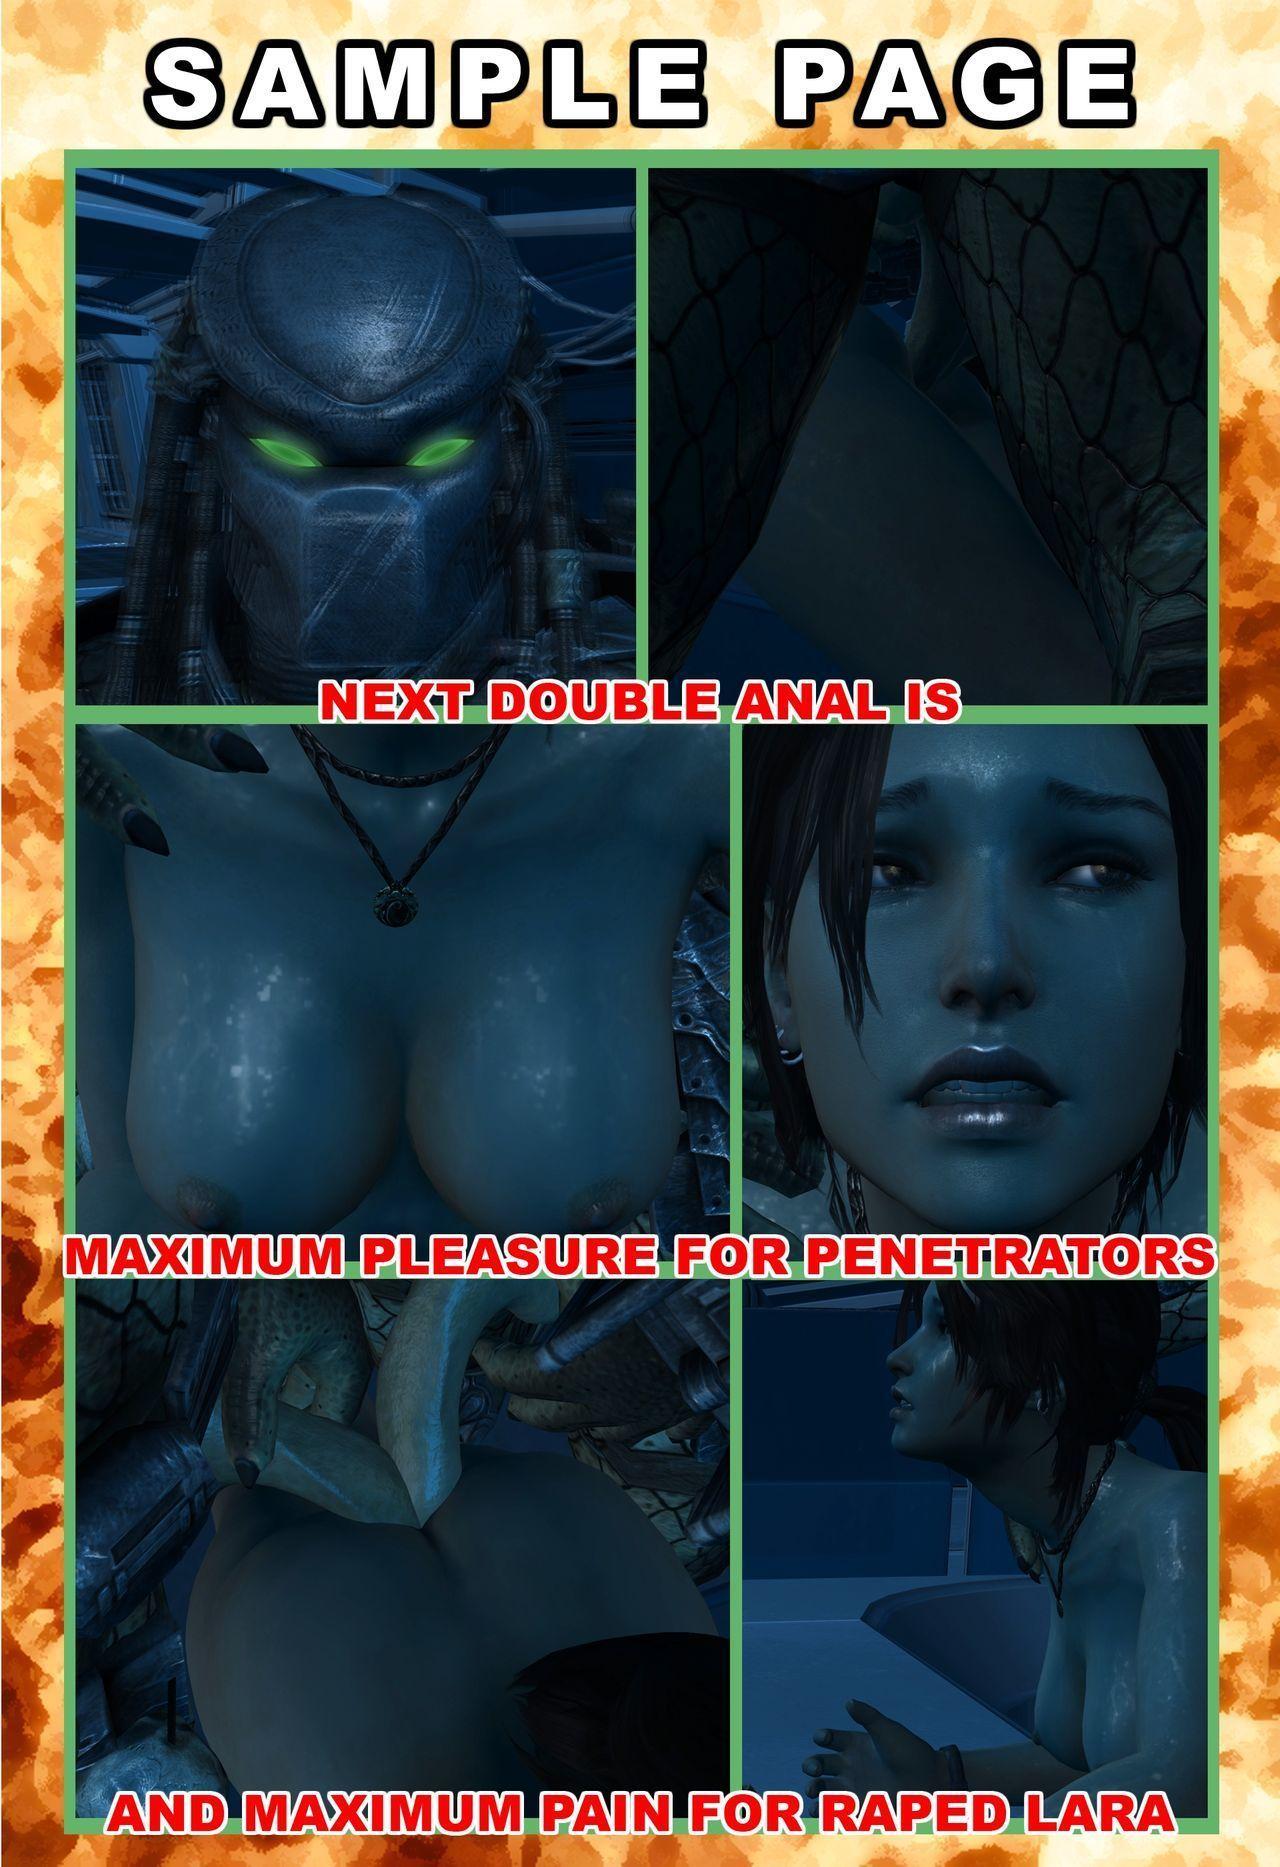 Lady & Cop VS Penetrator 3 (Preview)